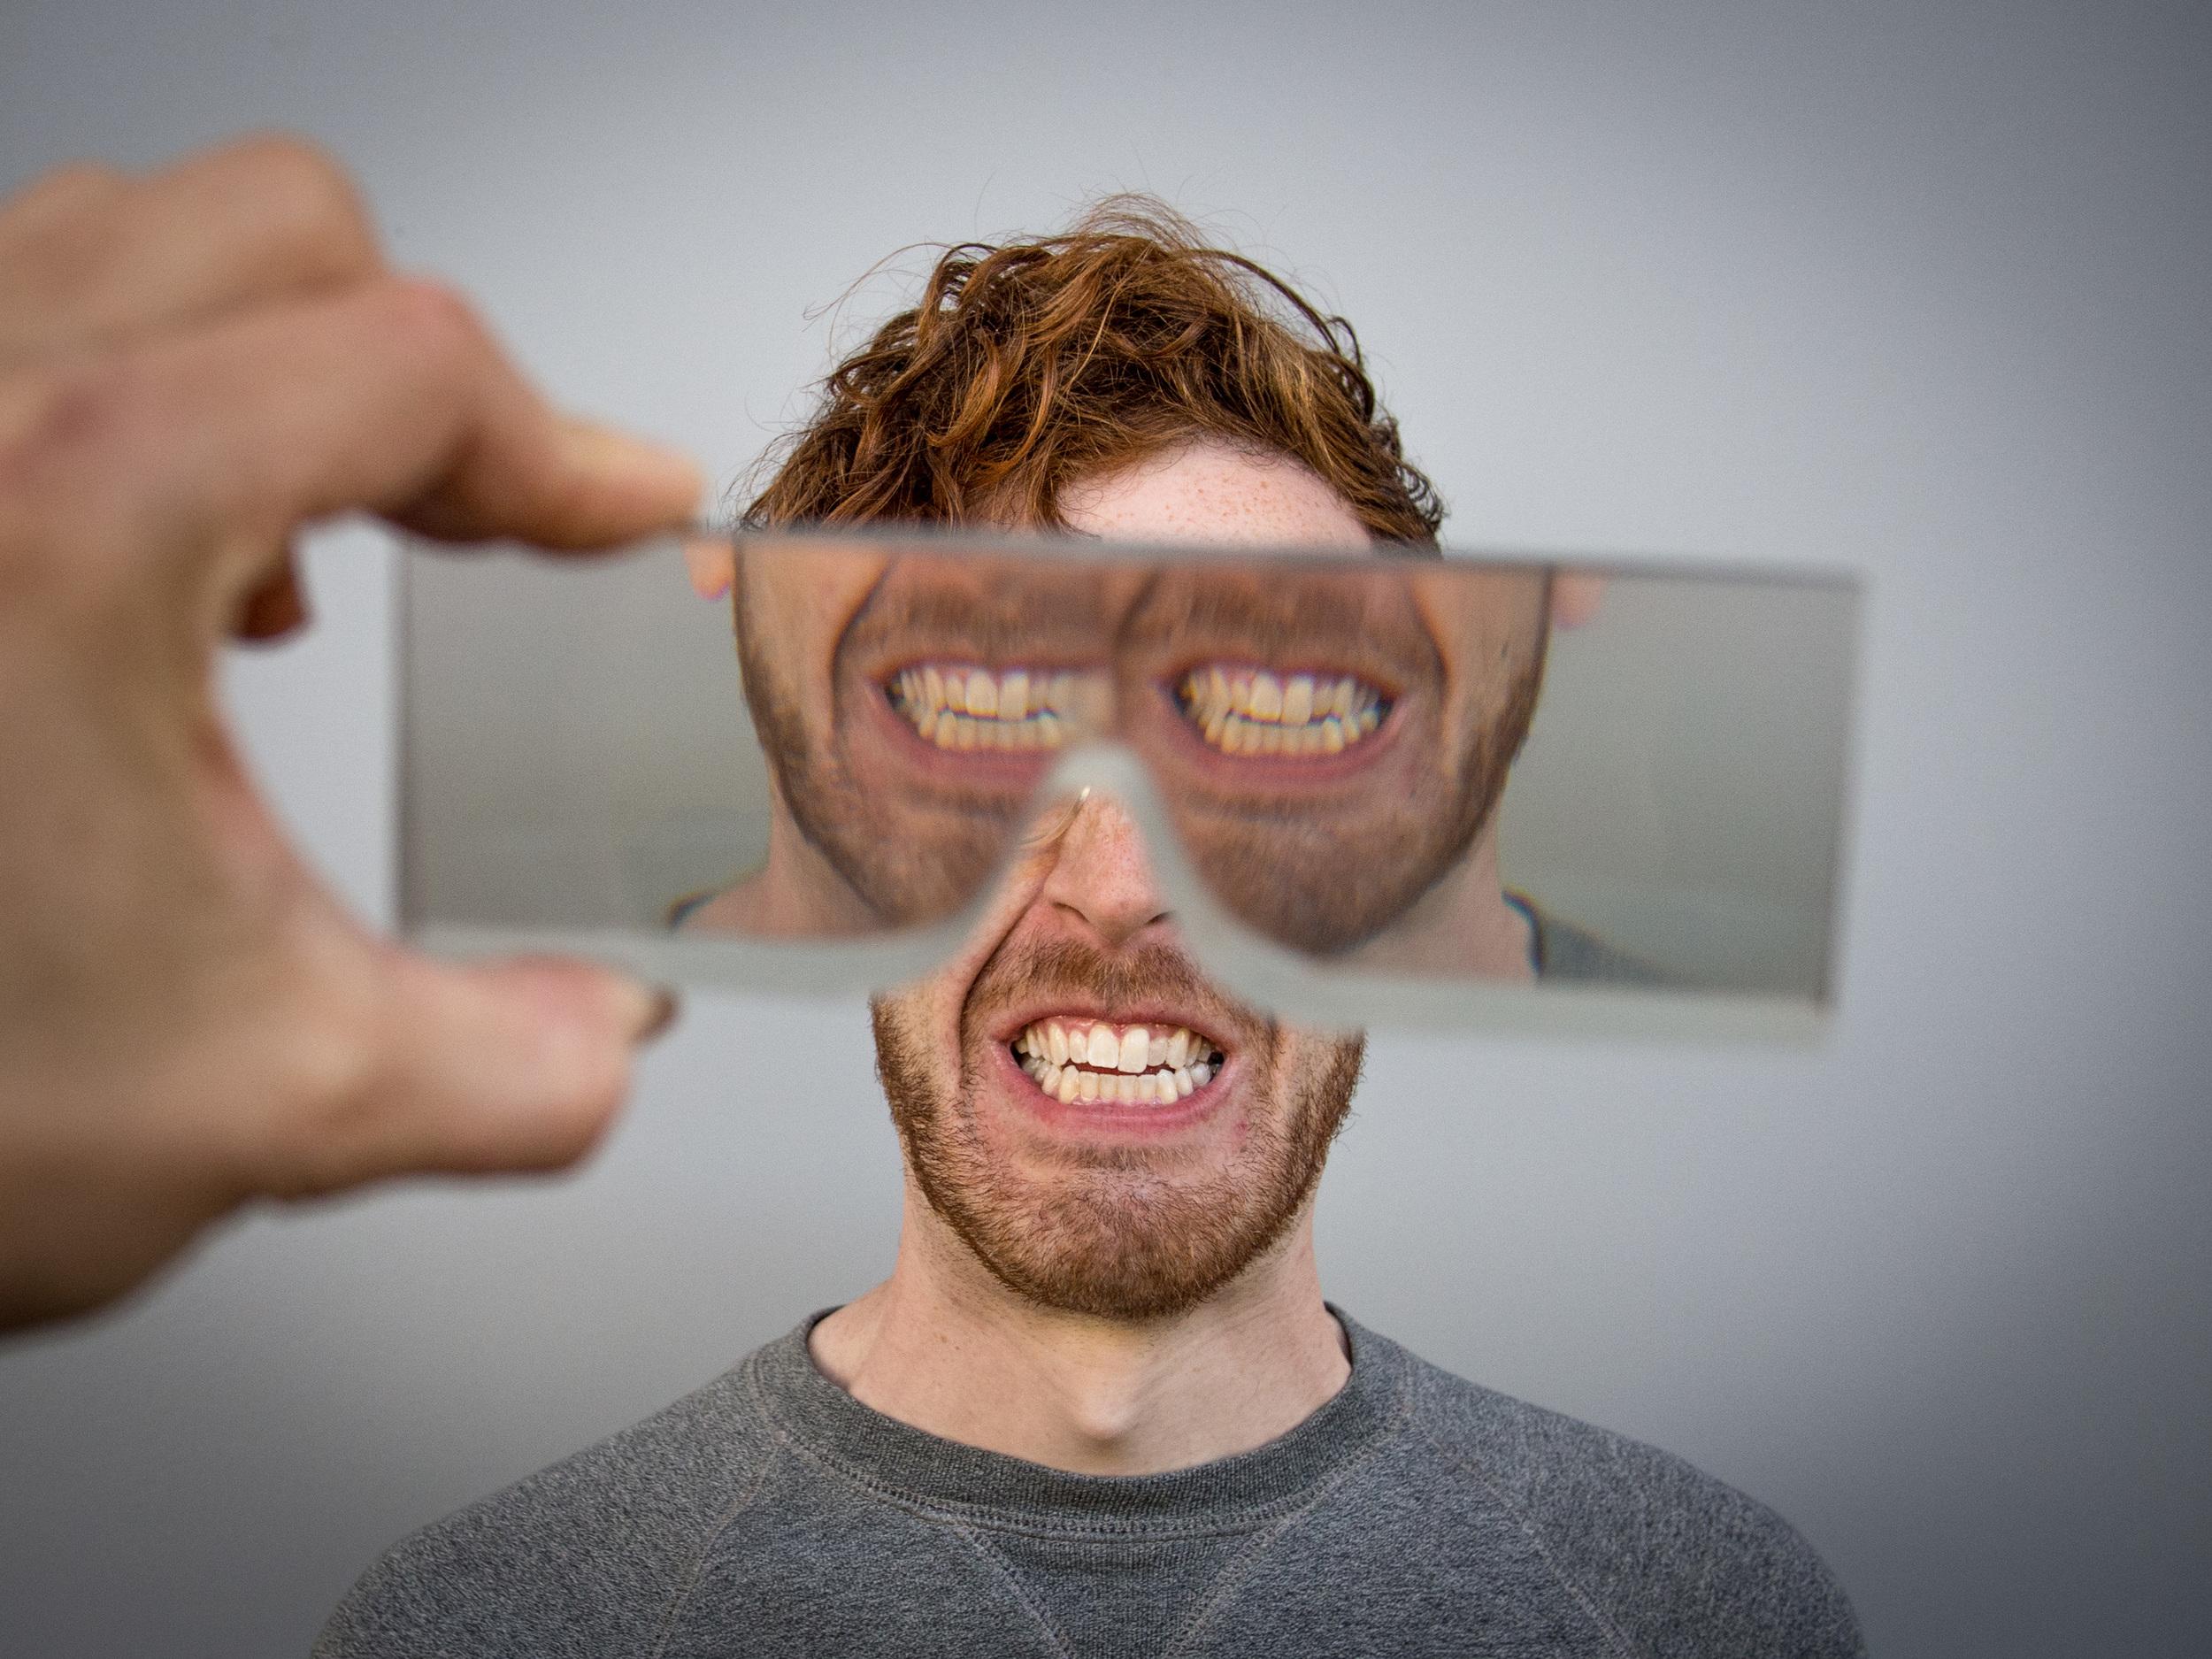 Mouth as Eyes Lens